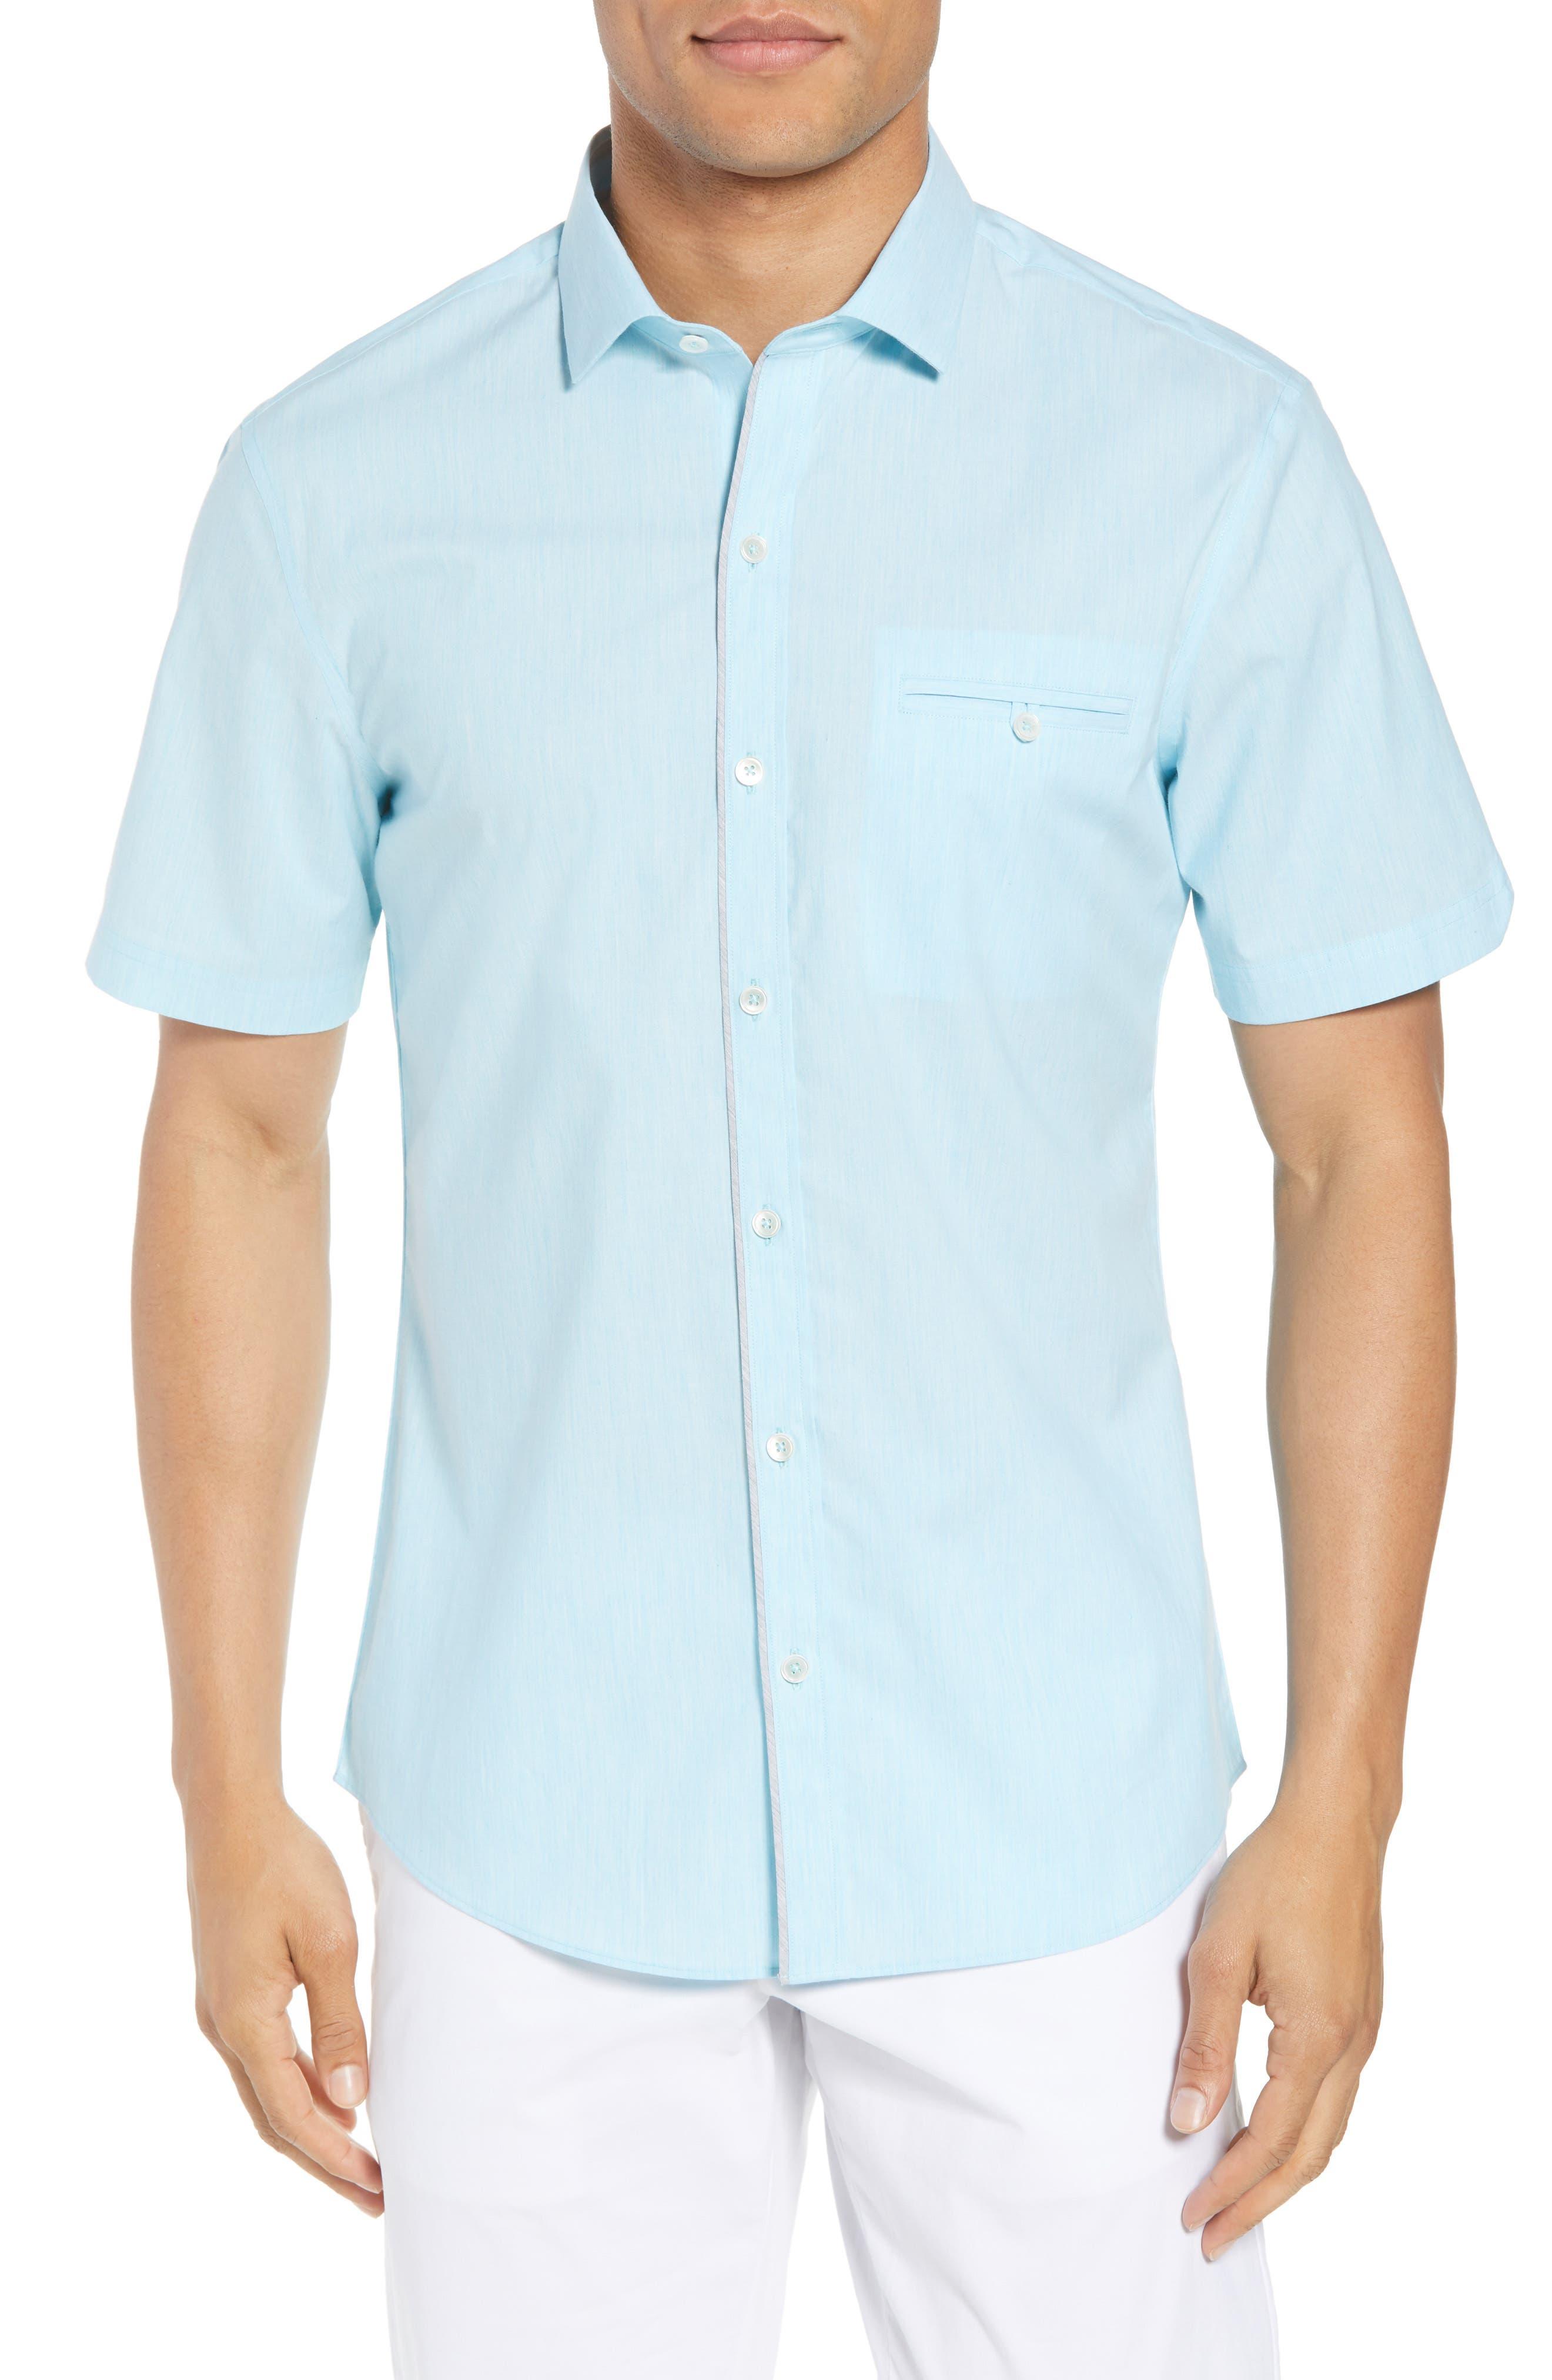 Baumann Slim Fit Sport Shirt,                         Main,                         color, Aqua